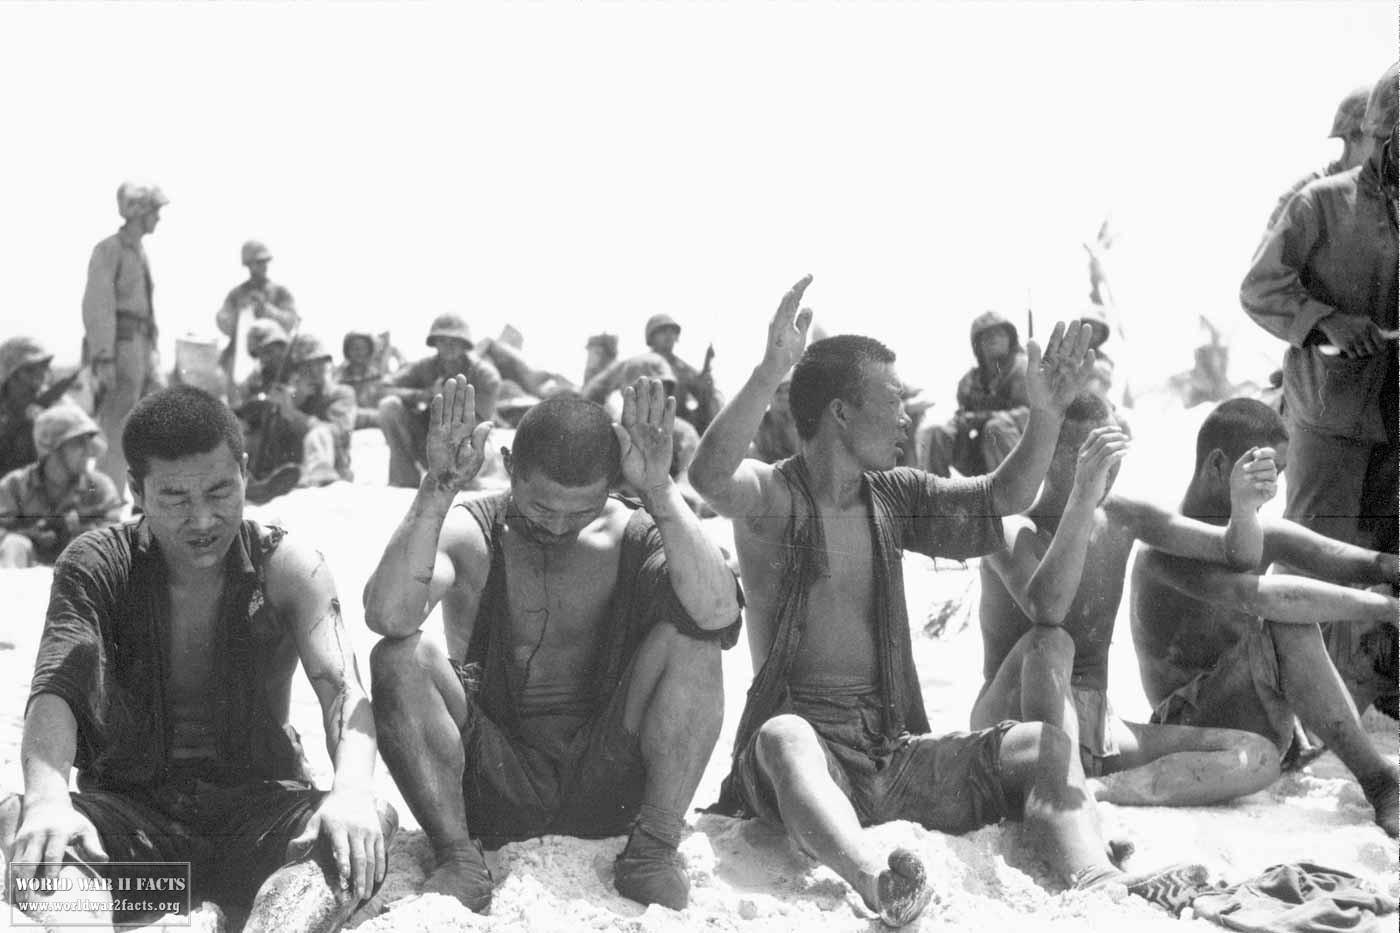 Japanese prisoners of war at the Battle of tarawa